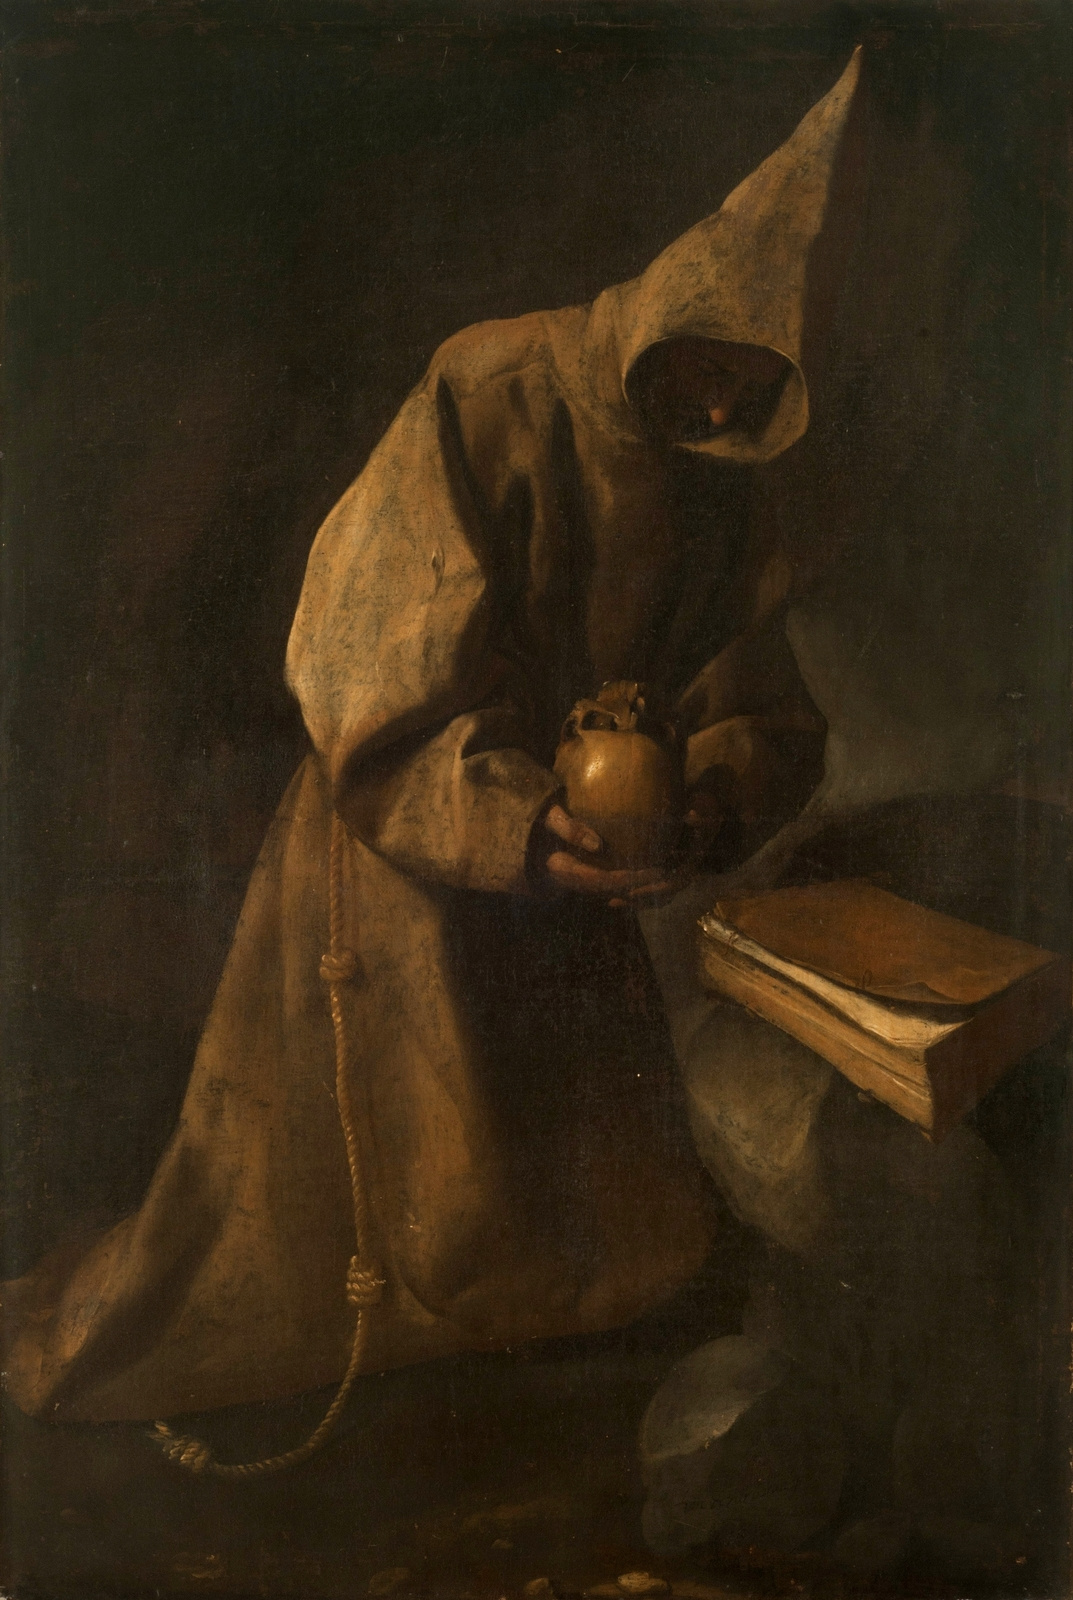 Francisco de Zurbaran. St. Francis during contemplation